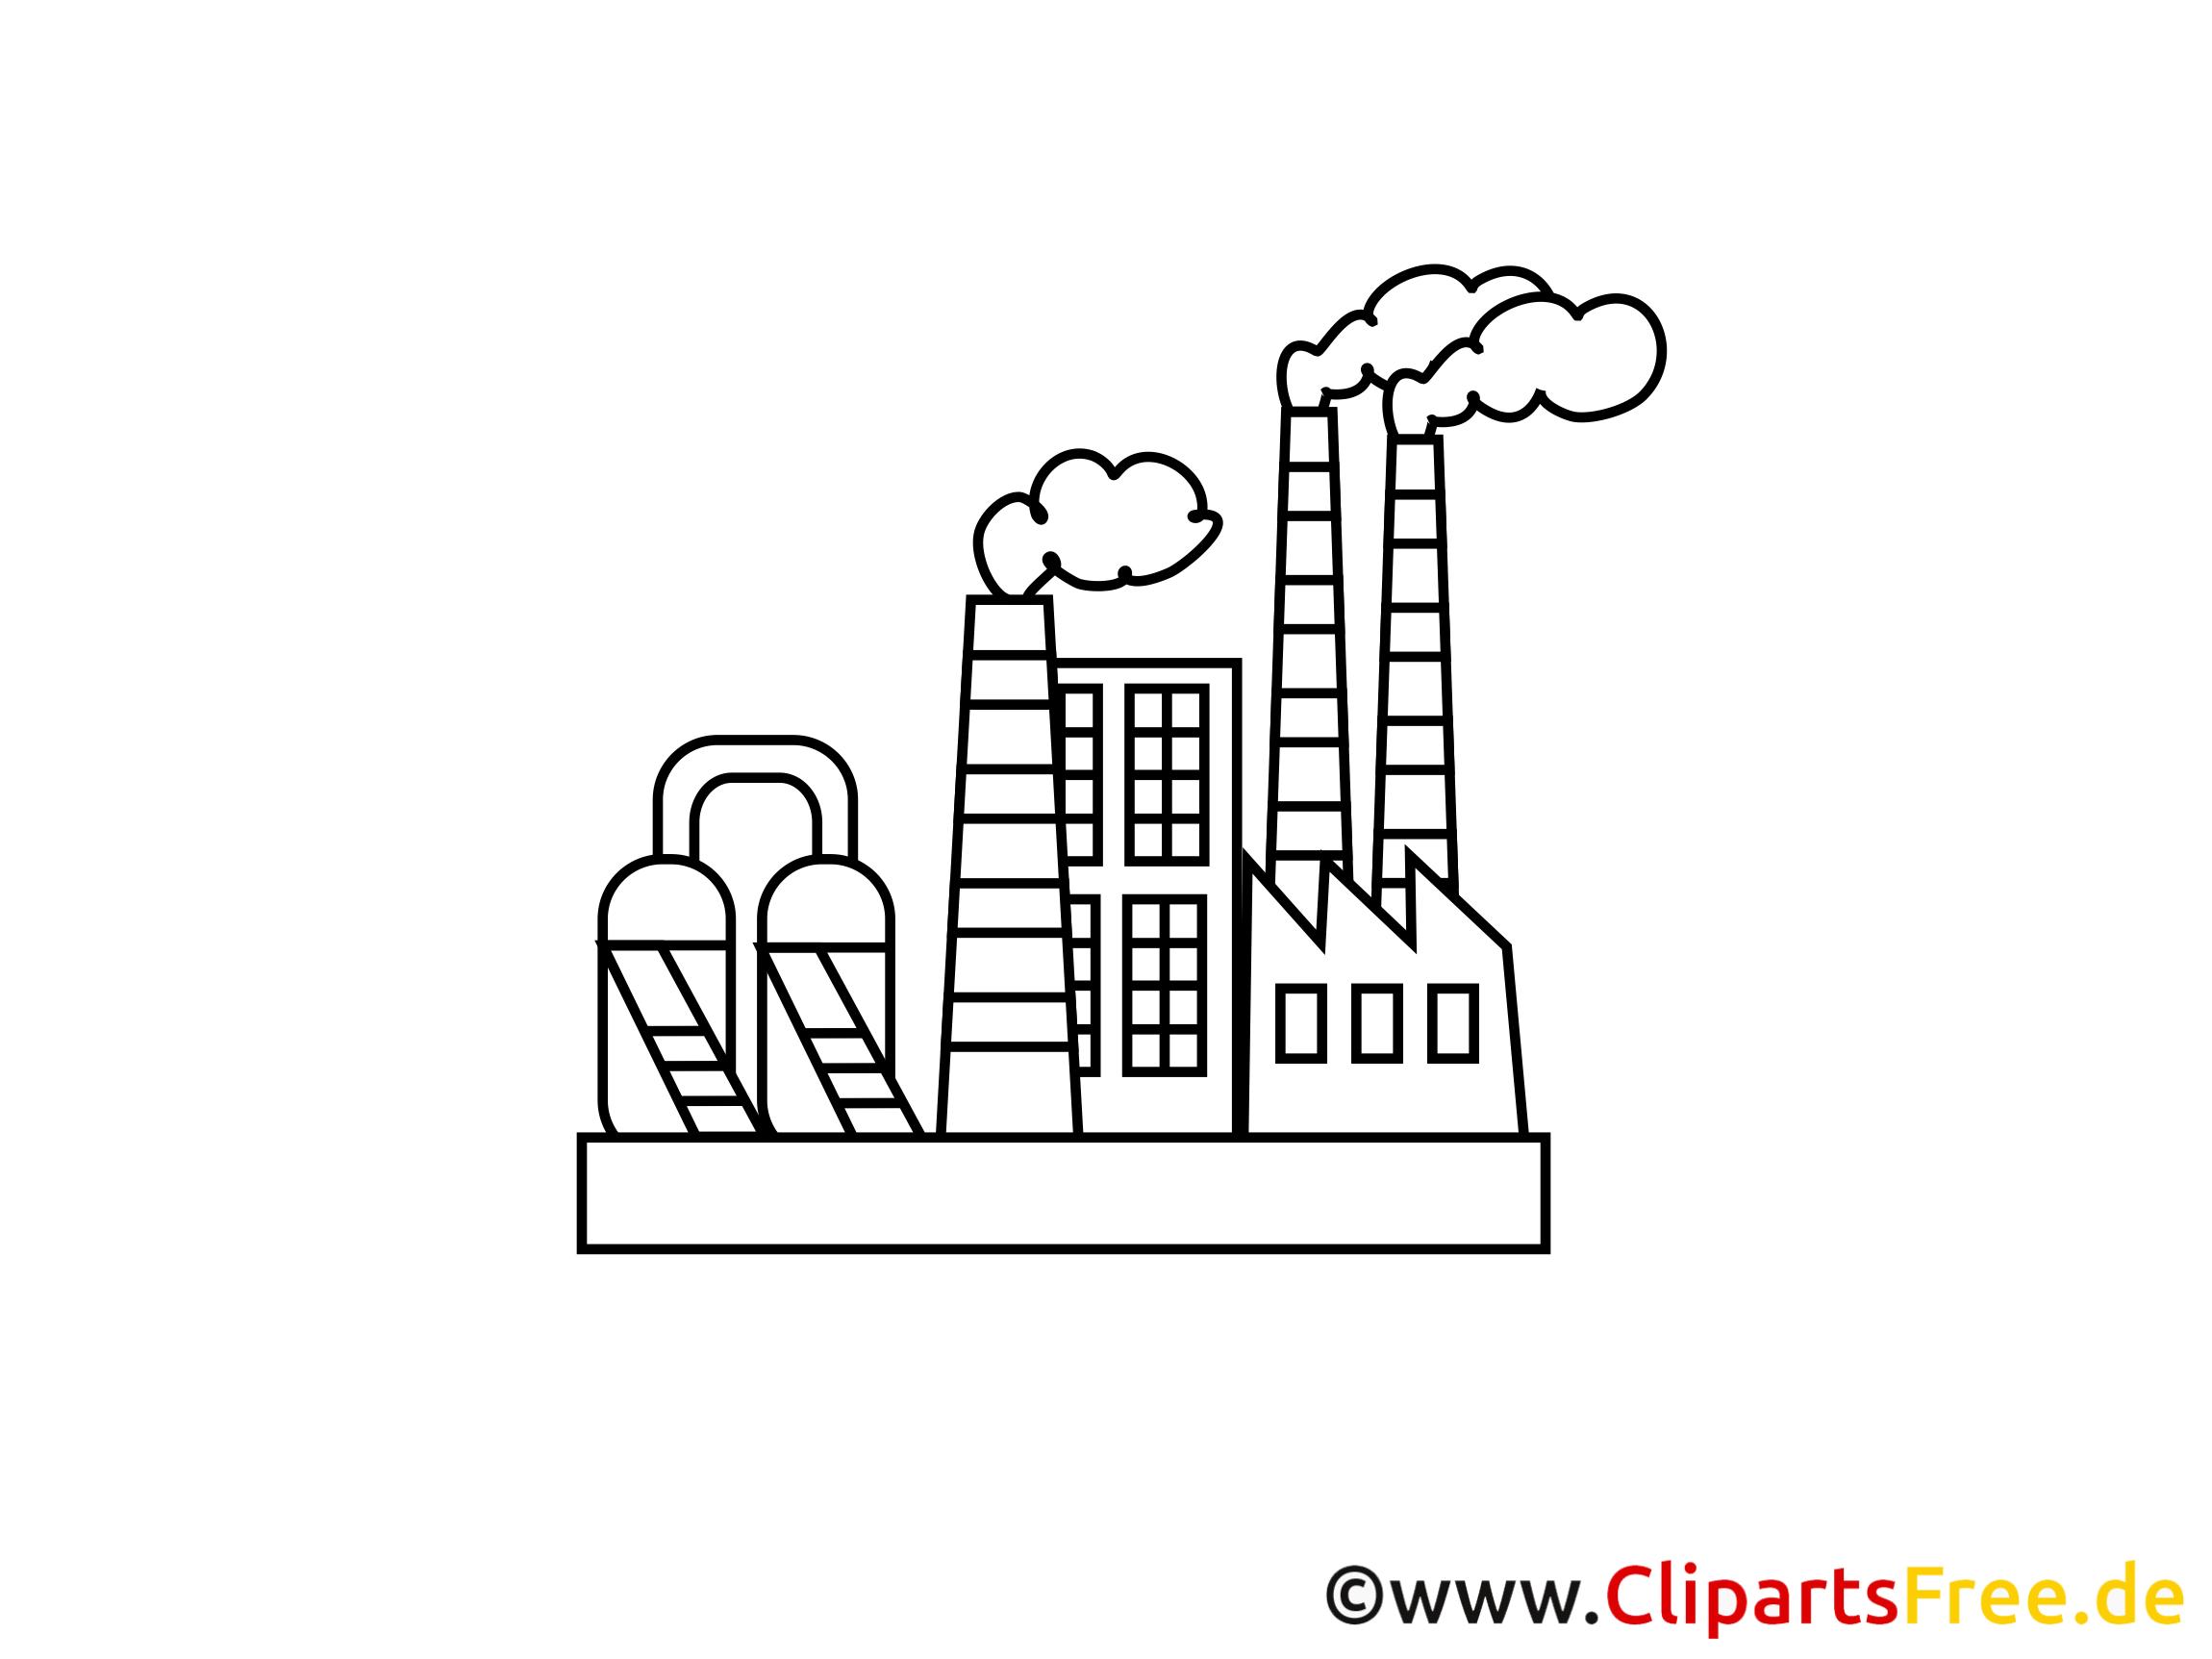 atomkraftwerk clipart - photo #10